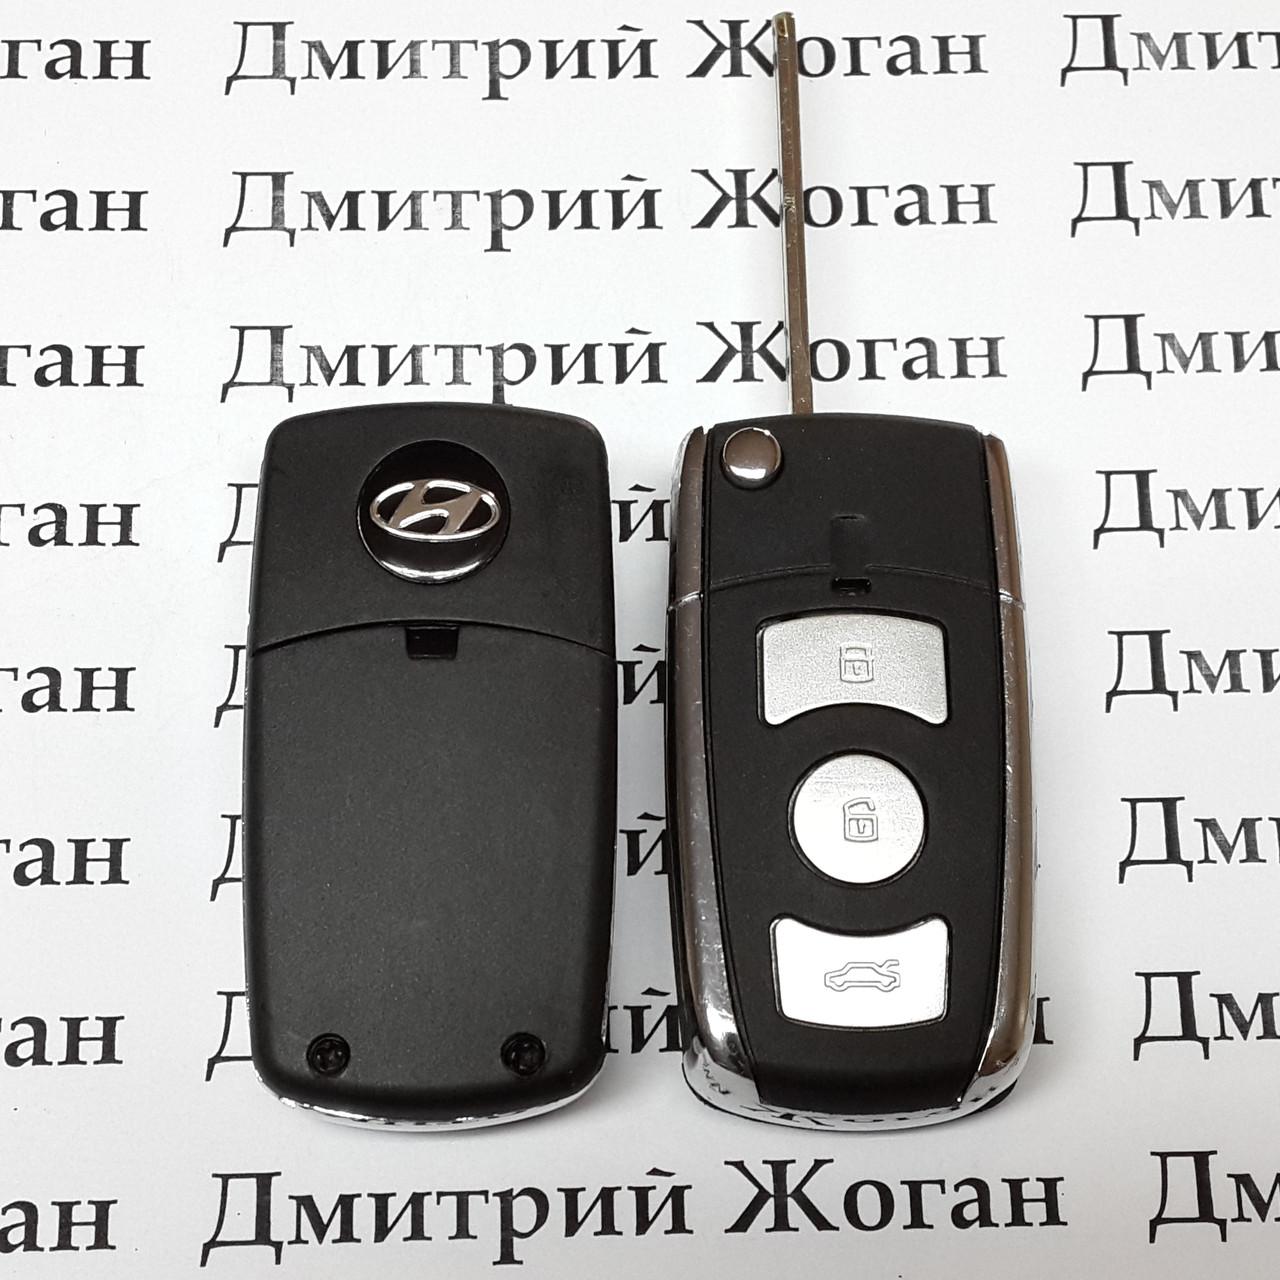 Корпус выкидного автоключа Hyudai (Хундай) 3 кнопки